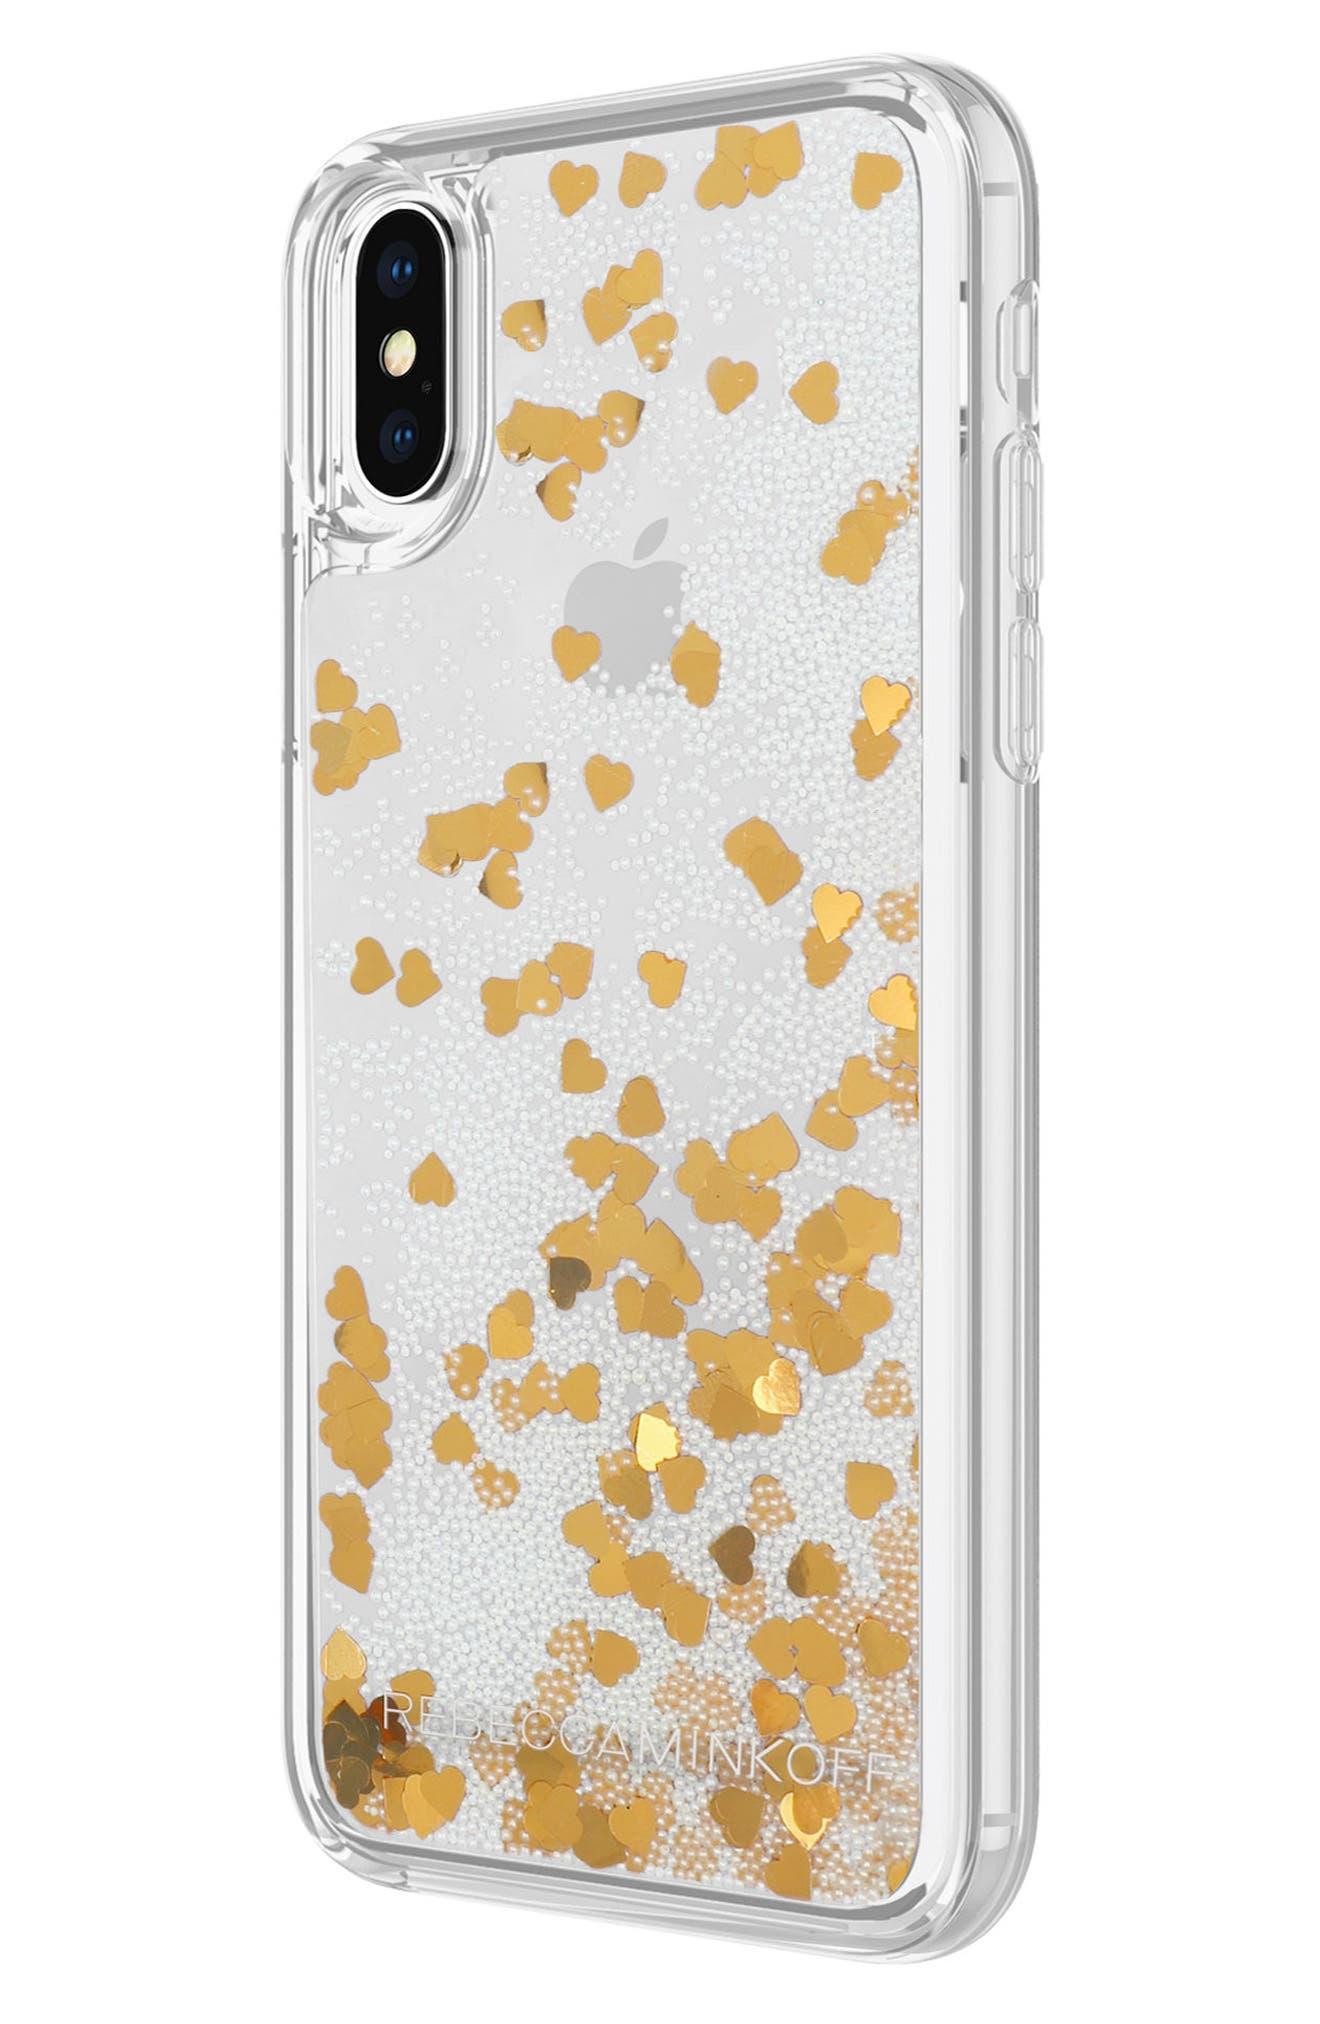 Glitterfall iPhone 8 Plus Case,                             Alternate thumbnail 4, color,                             Mini Pearls/ Heart Confetti